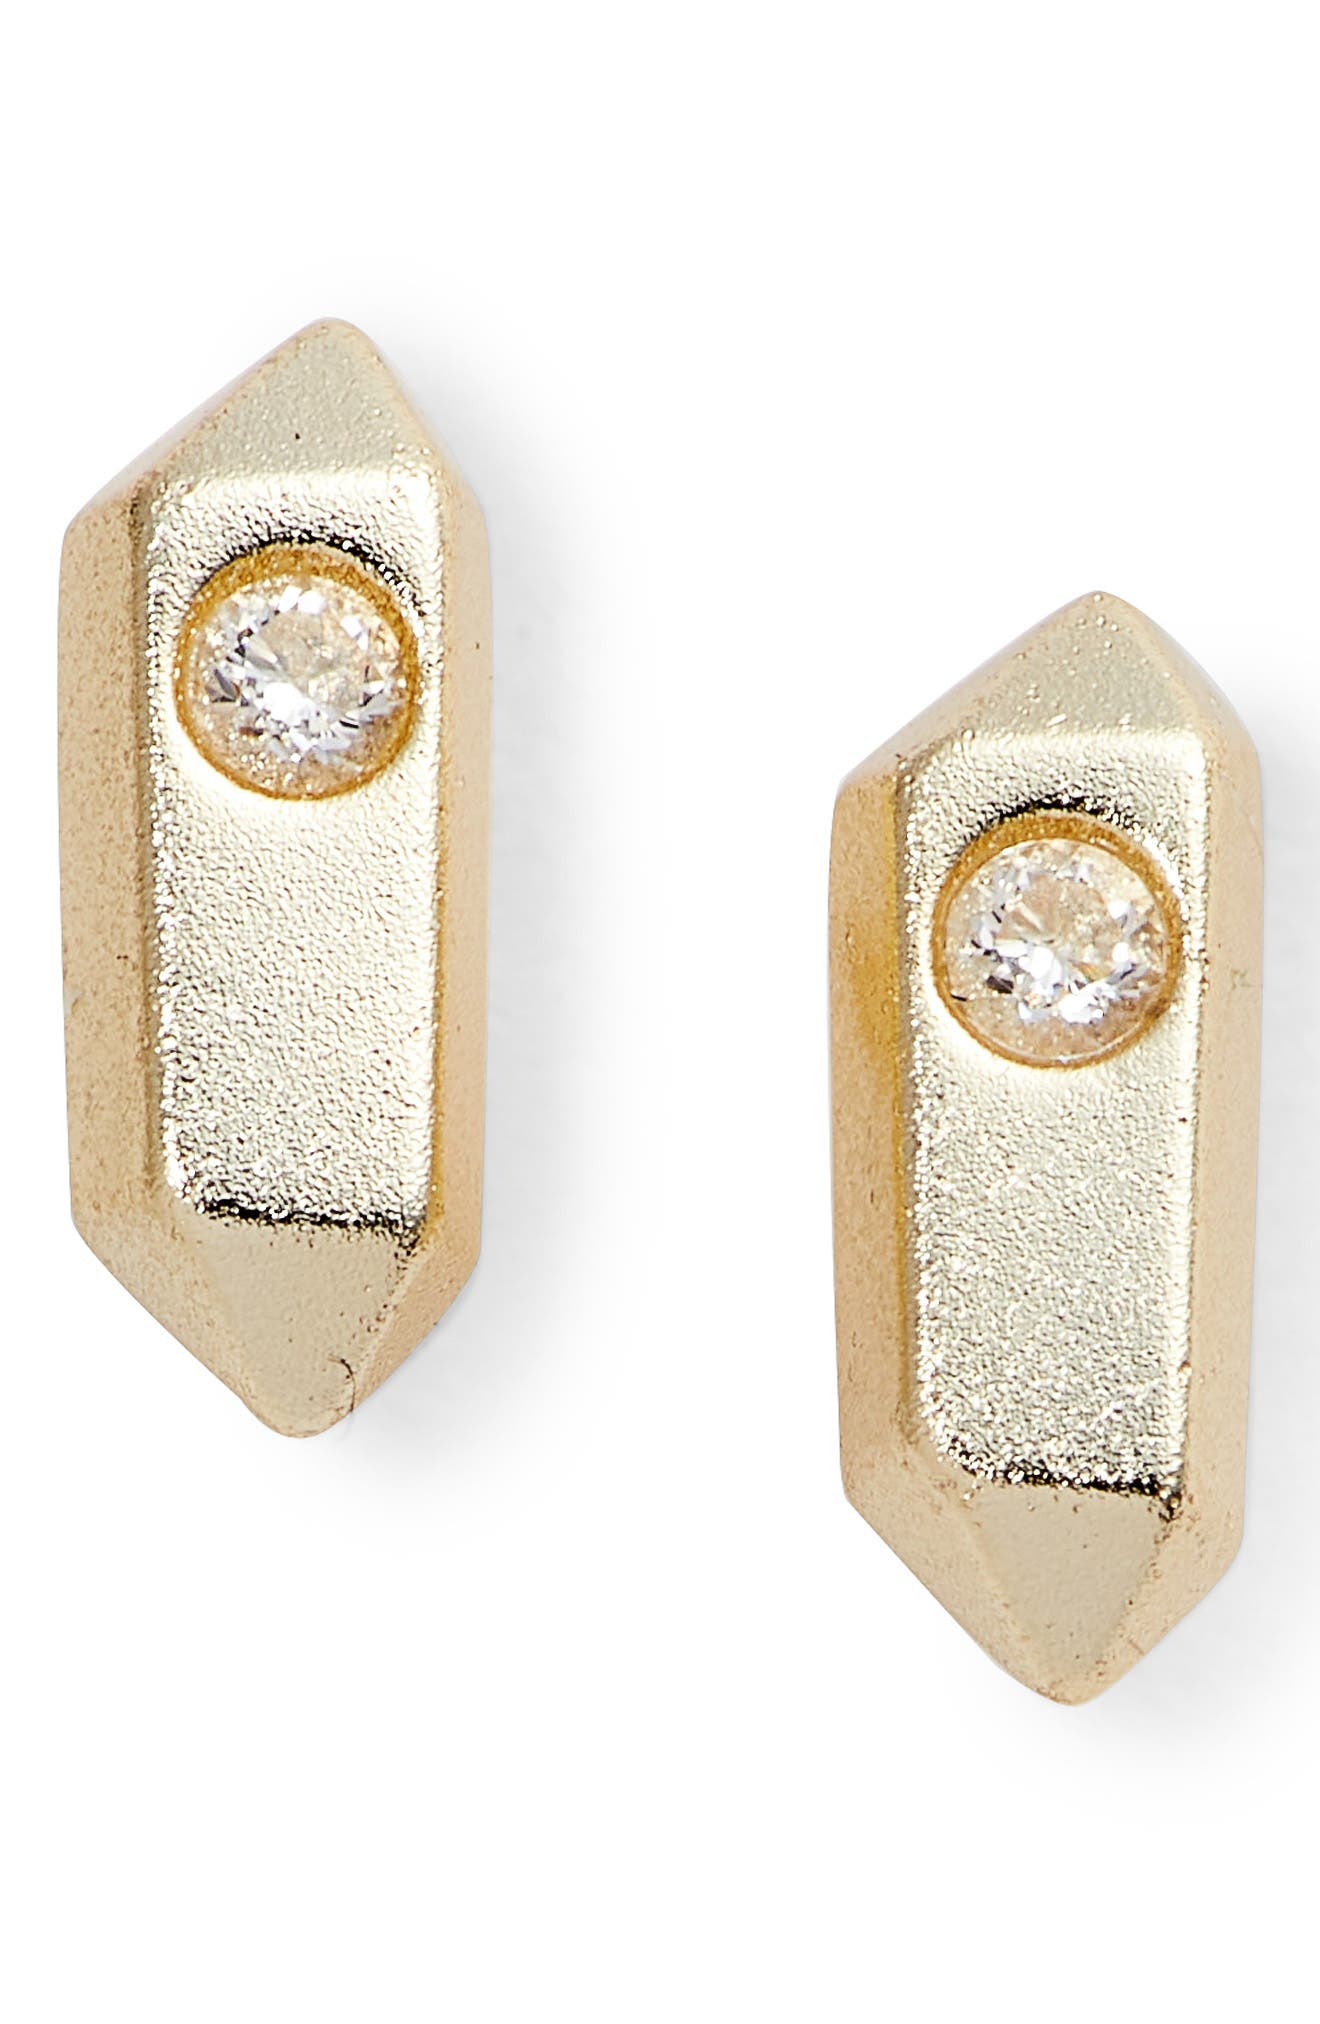 Rooney Stud Earrings,                             Main thumbnail 1, color,                             Gold